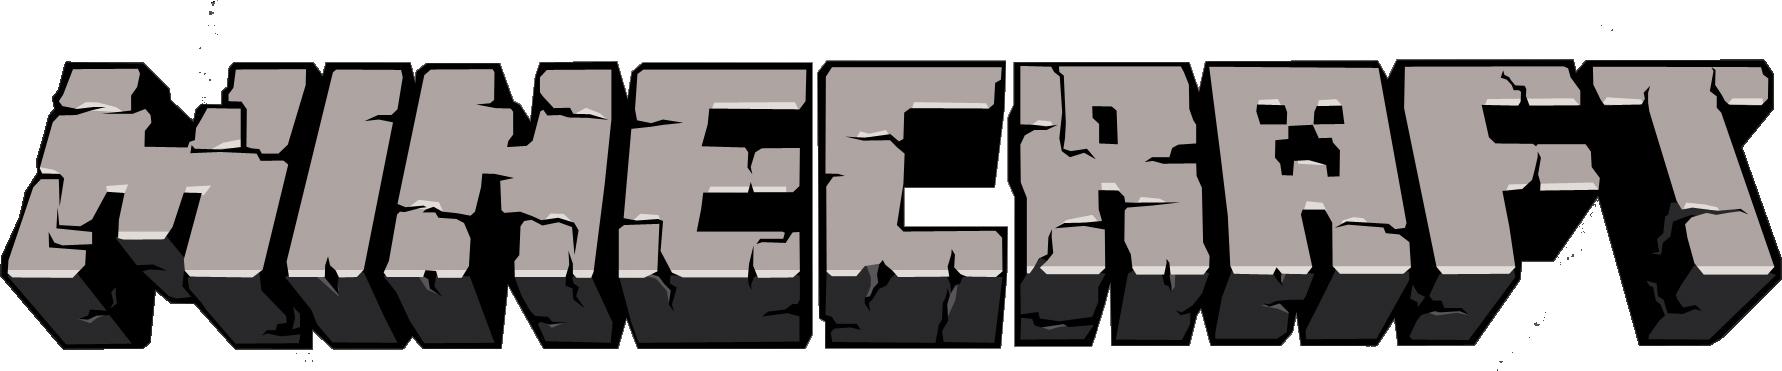 Minecraft PNG - 5586